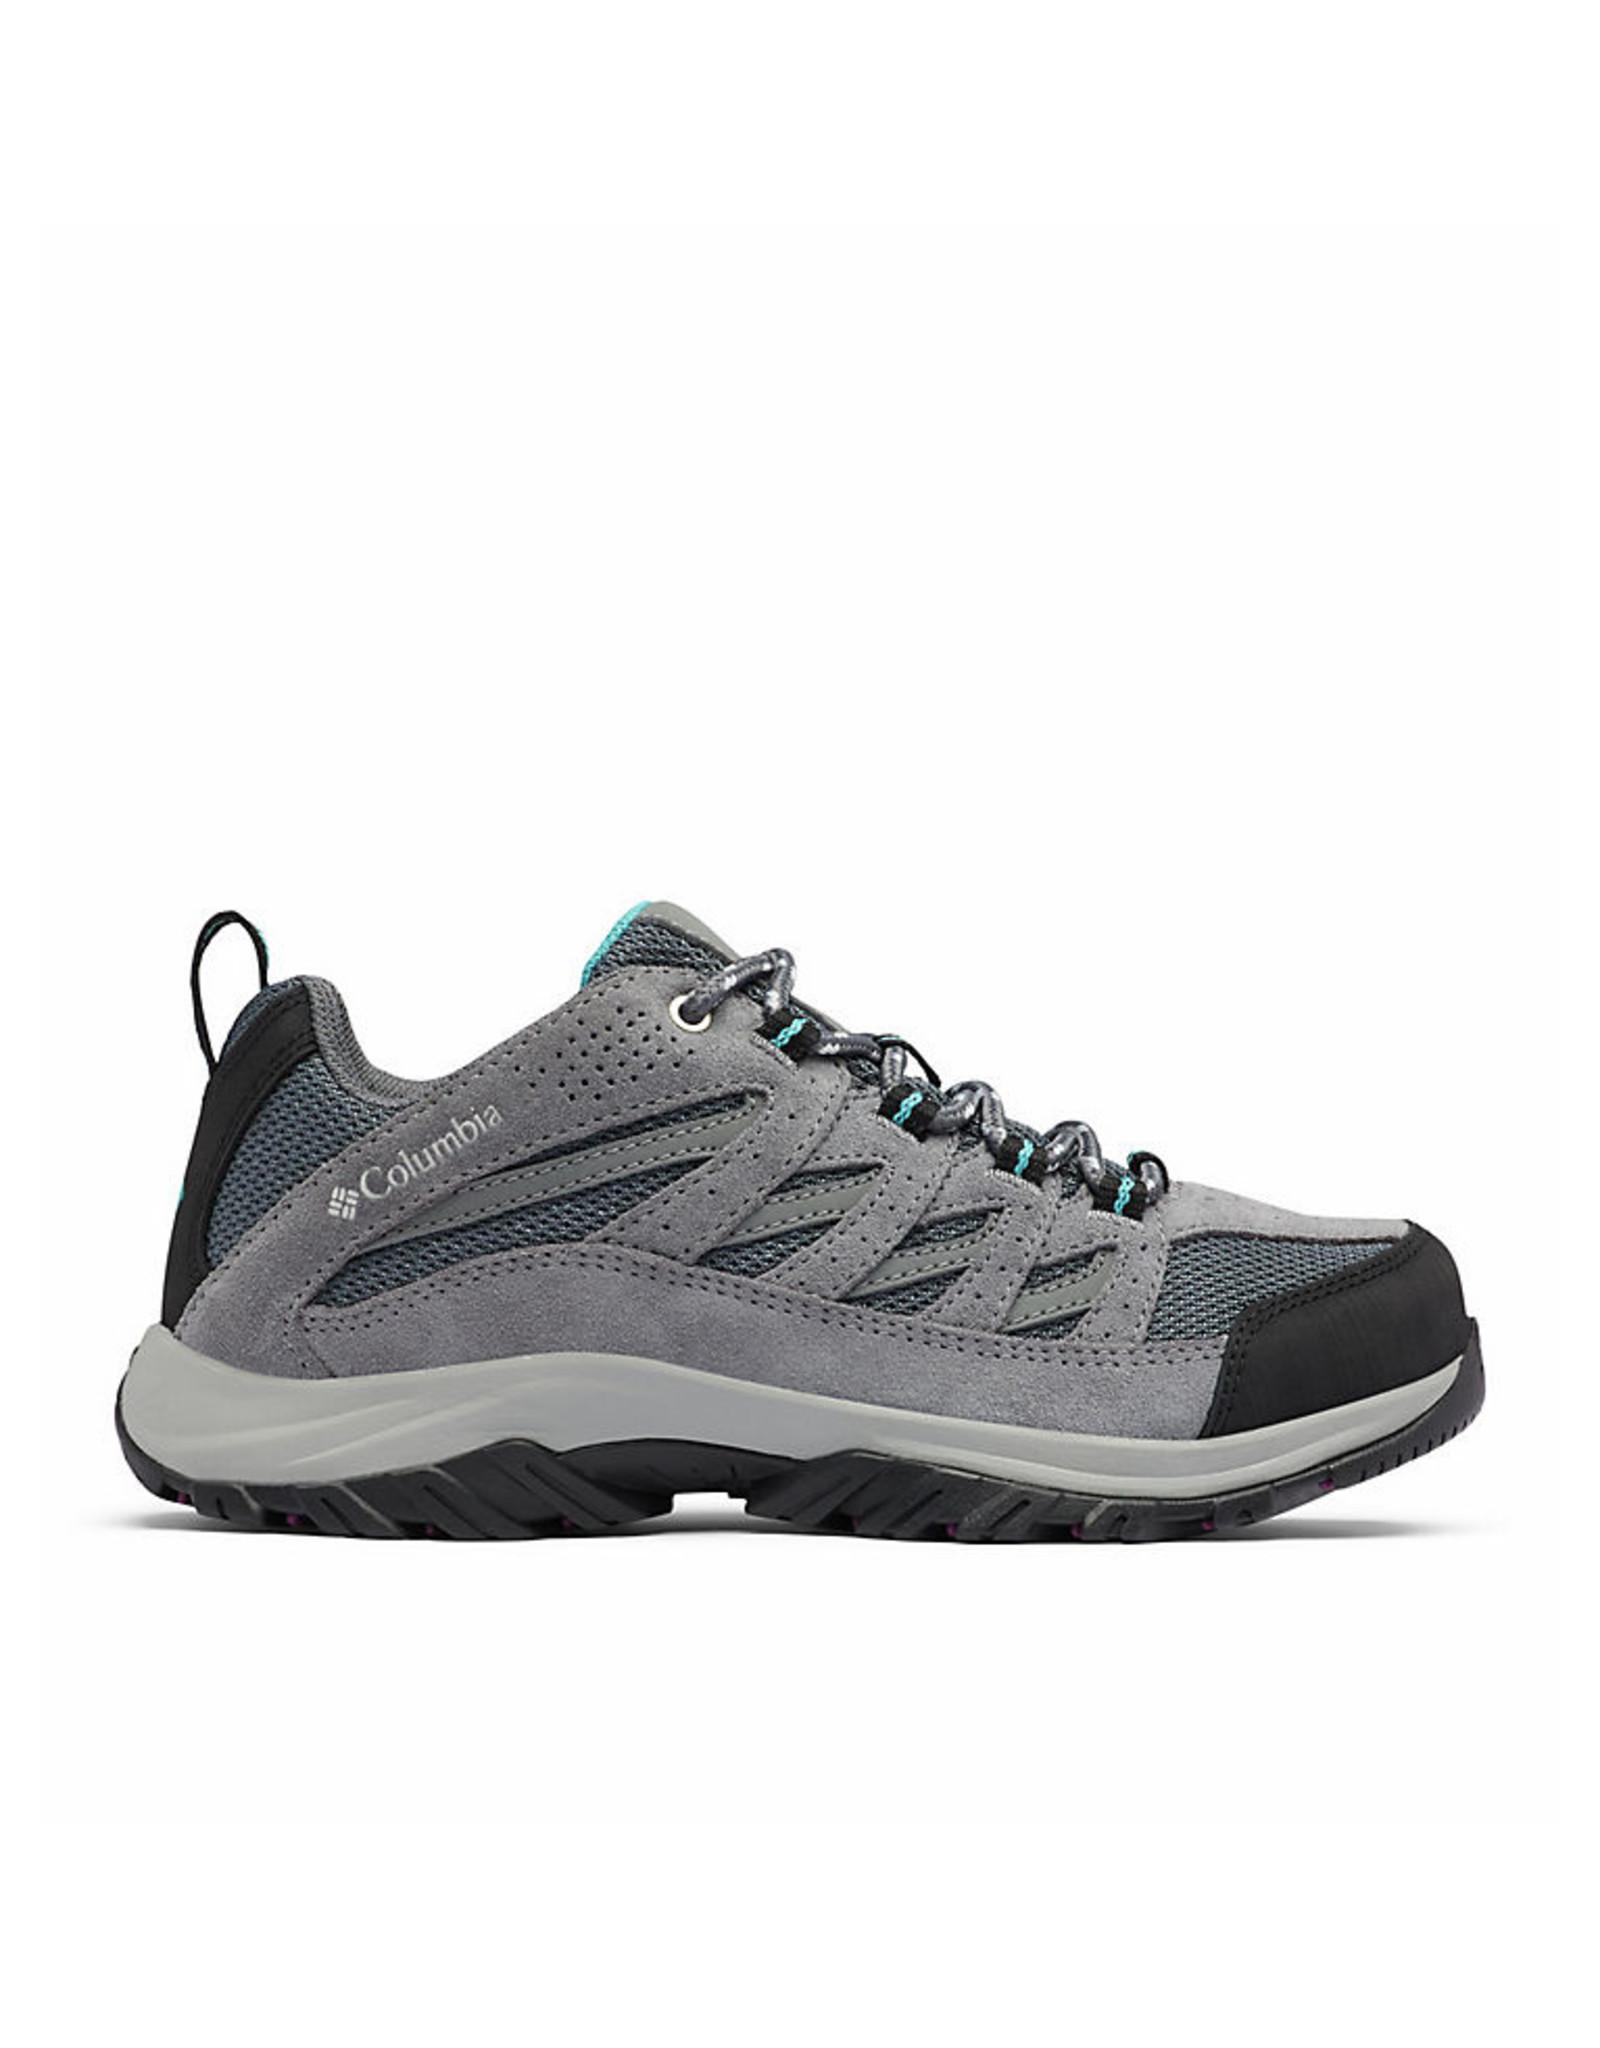 Columbia Columbia - W's Crestwood Hiking Shoe